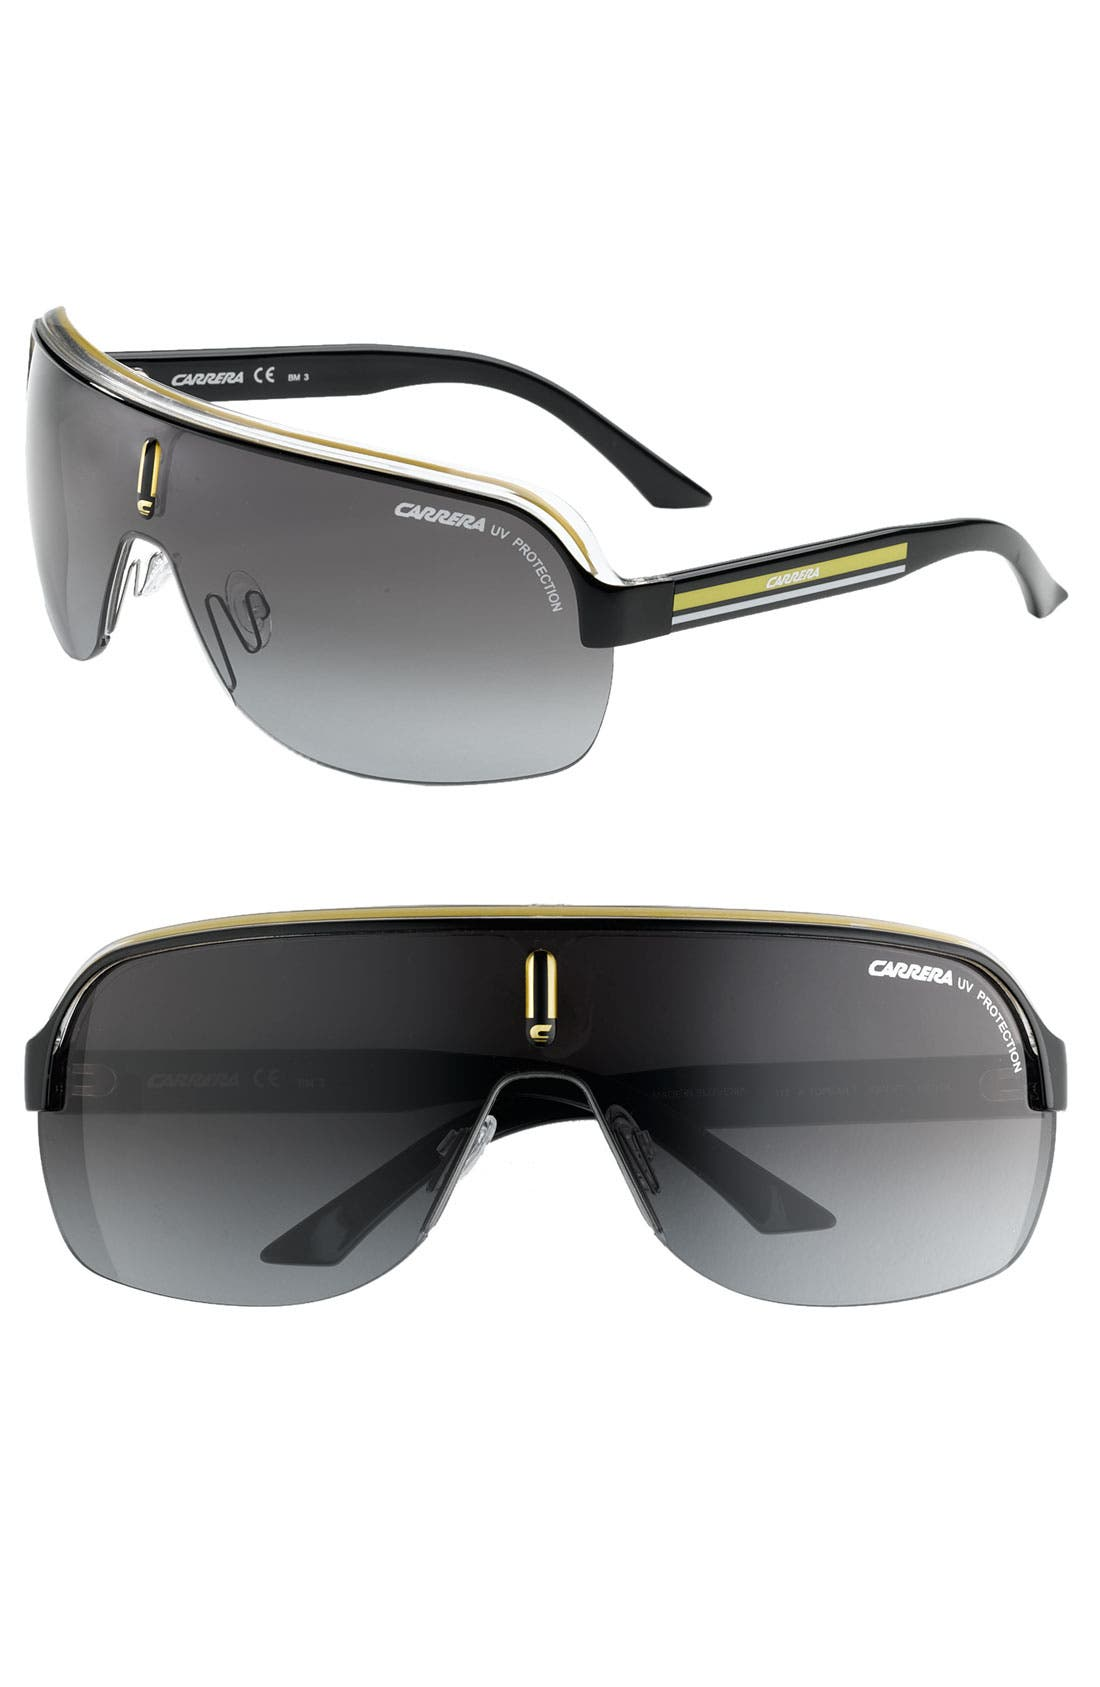 Main Image - Carrera Eyewear 99mm Shield Sunglasses